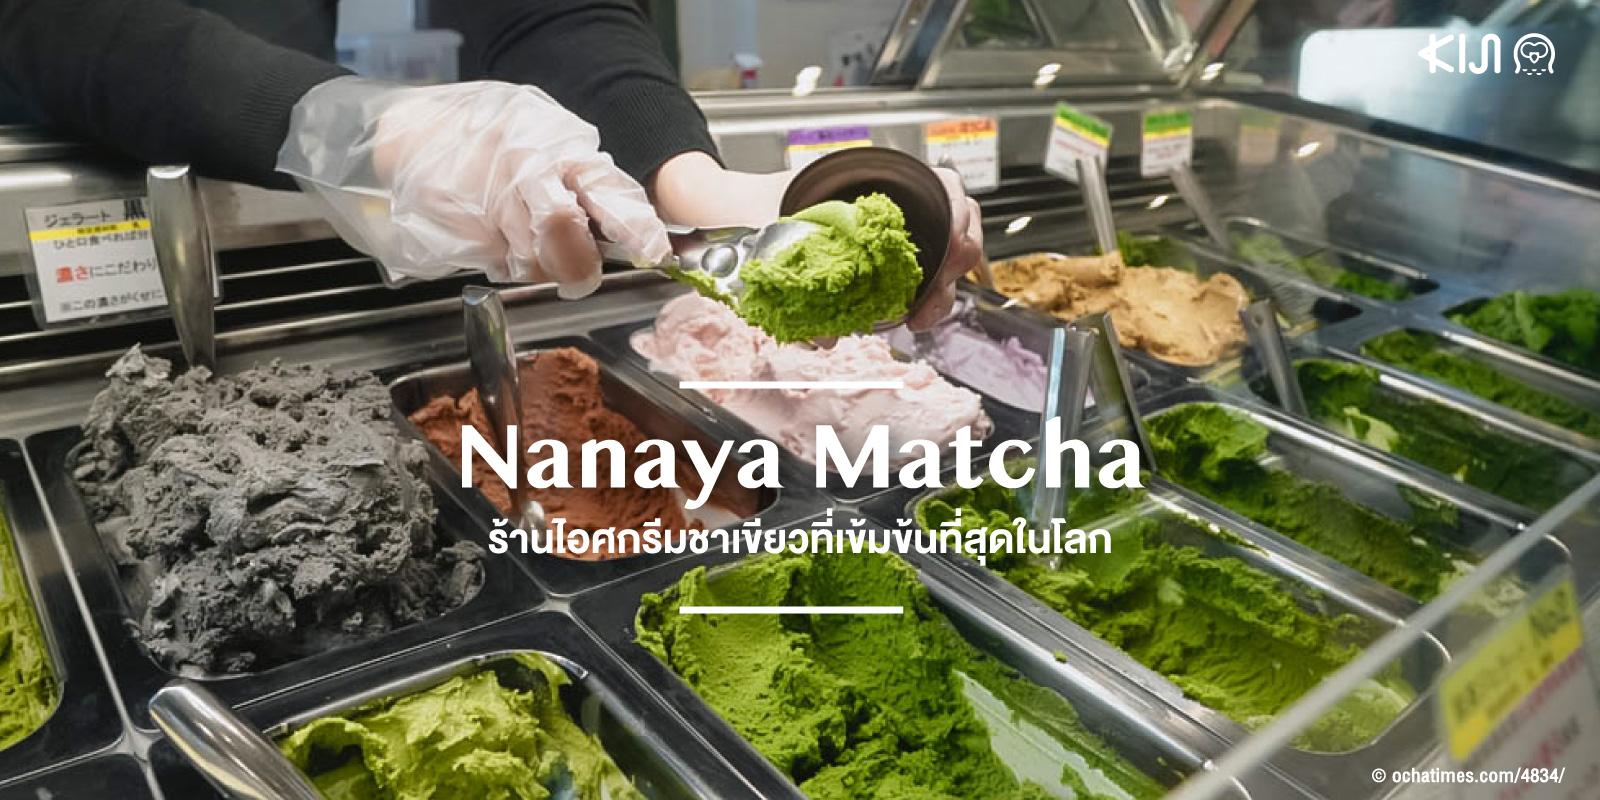 Nanaya Matcha ร้านไอศกรีมขาเขียวญี่ปุ่นที่เข้มข้นที่สุดในโลก